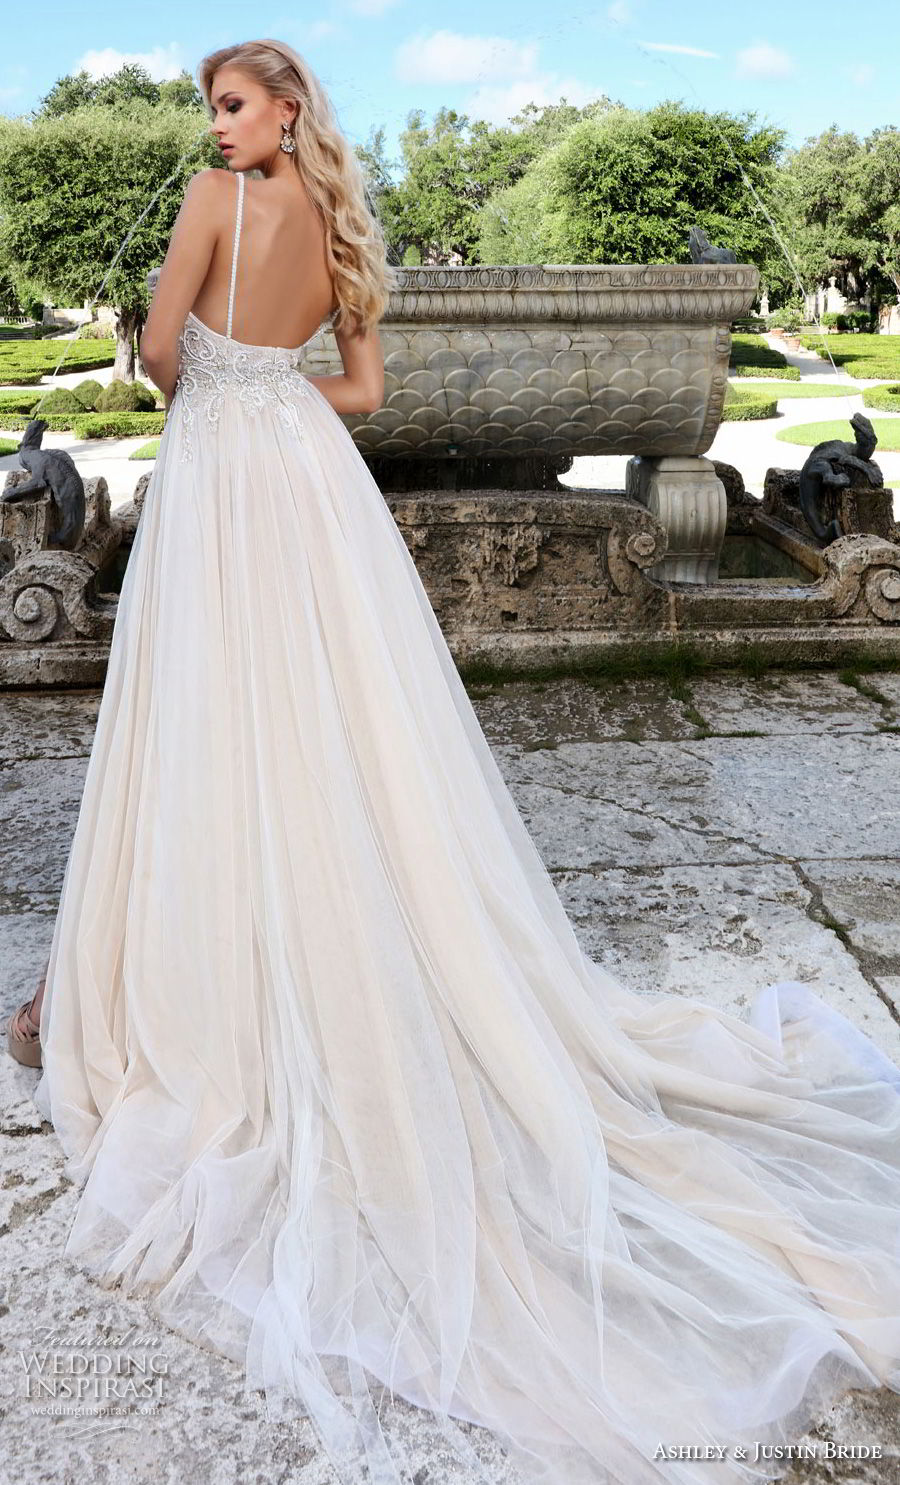 ashley justin spring 2018 bridal spaghetti strap sweetheart neckline heavily embellished bodice high slit skirt soft a  line wedding dress open back chapel train (11) bv